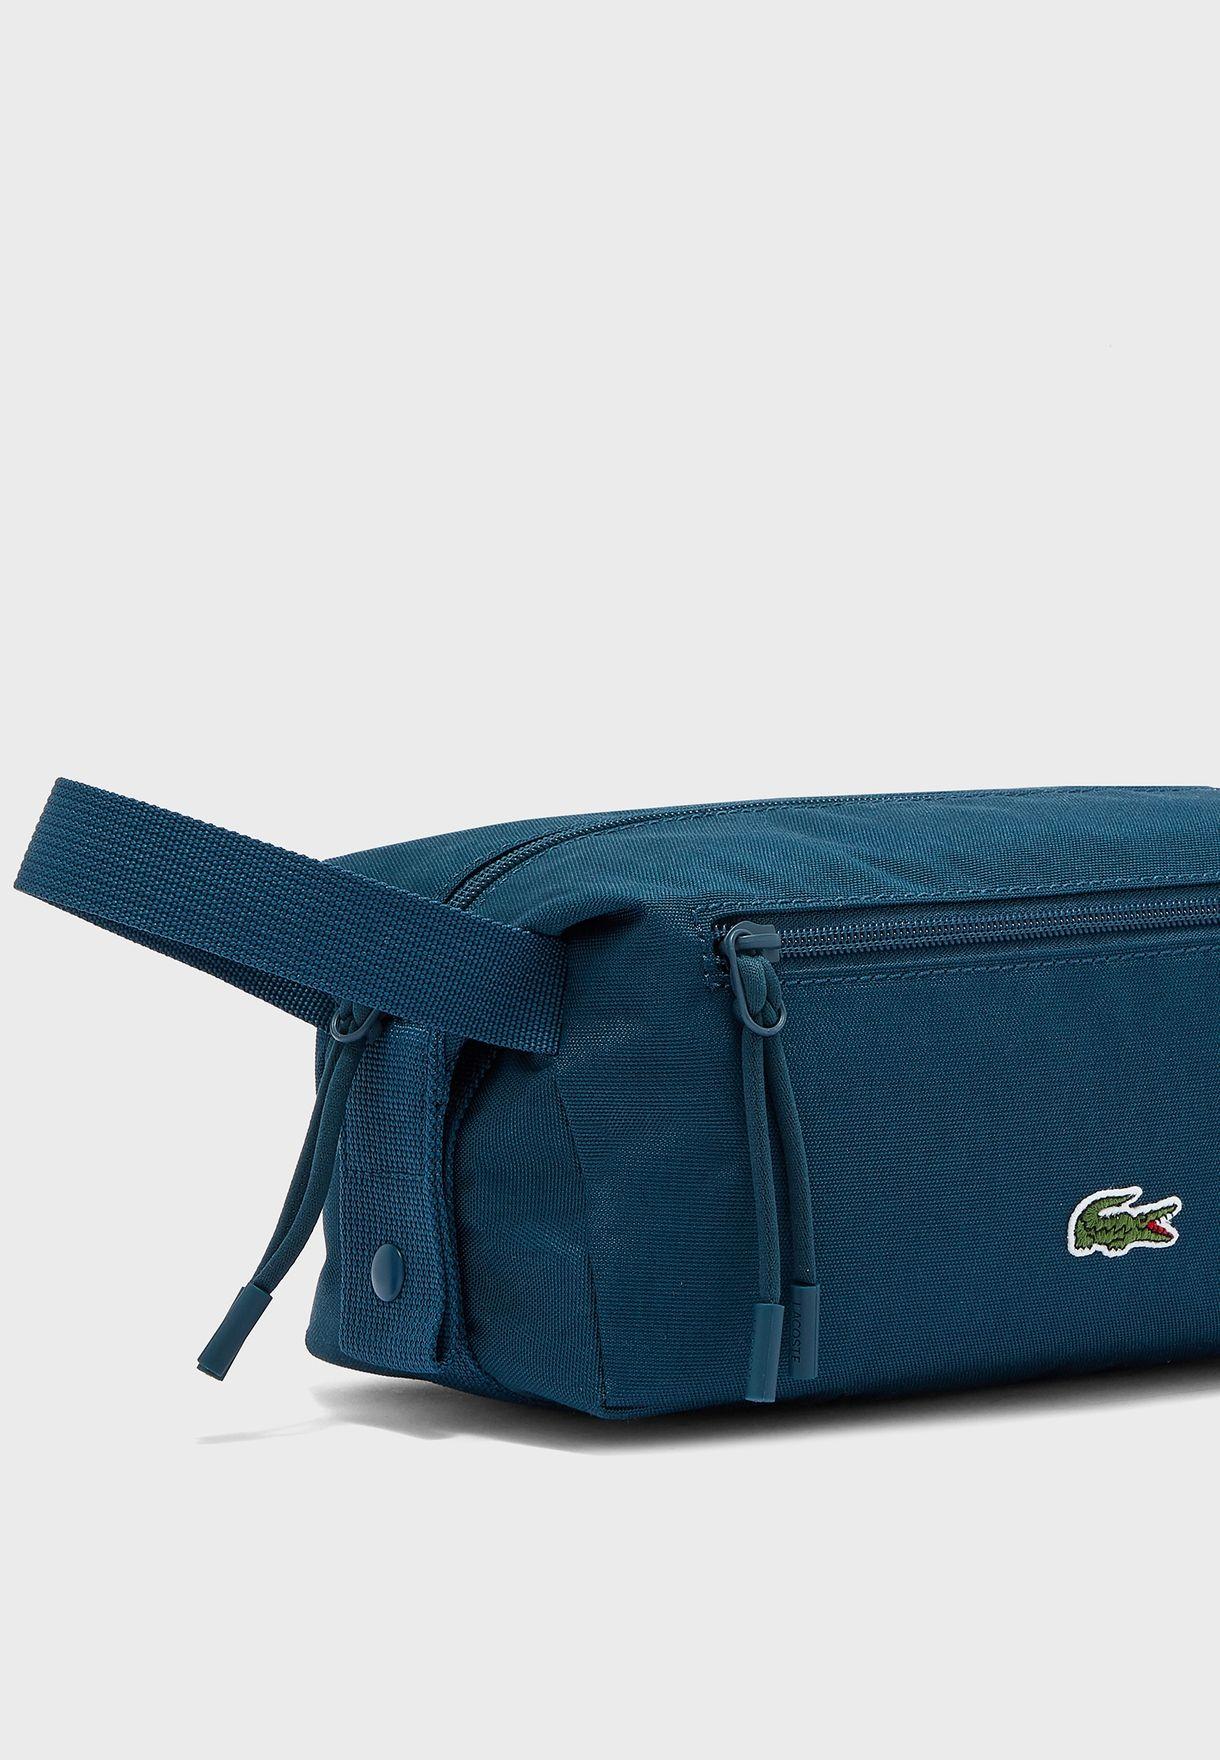 Neocroc Basic  Toiletry Bag